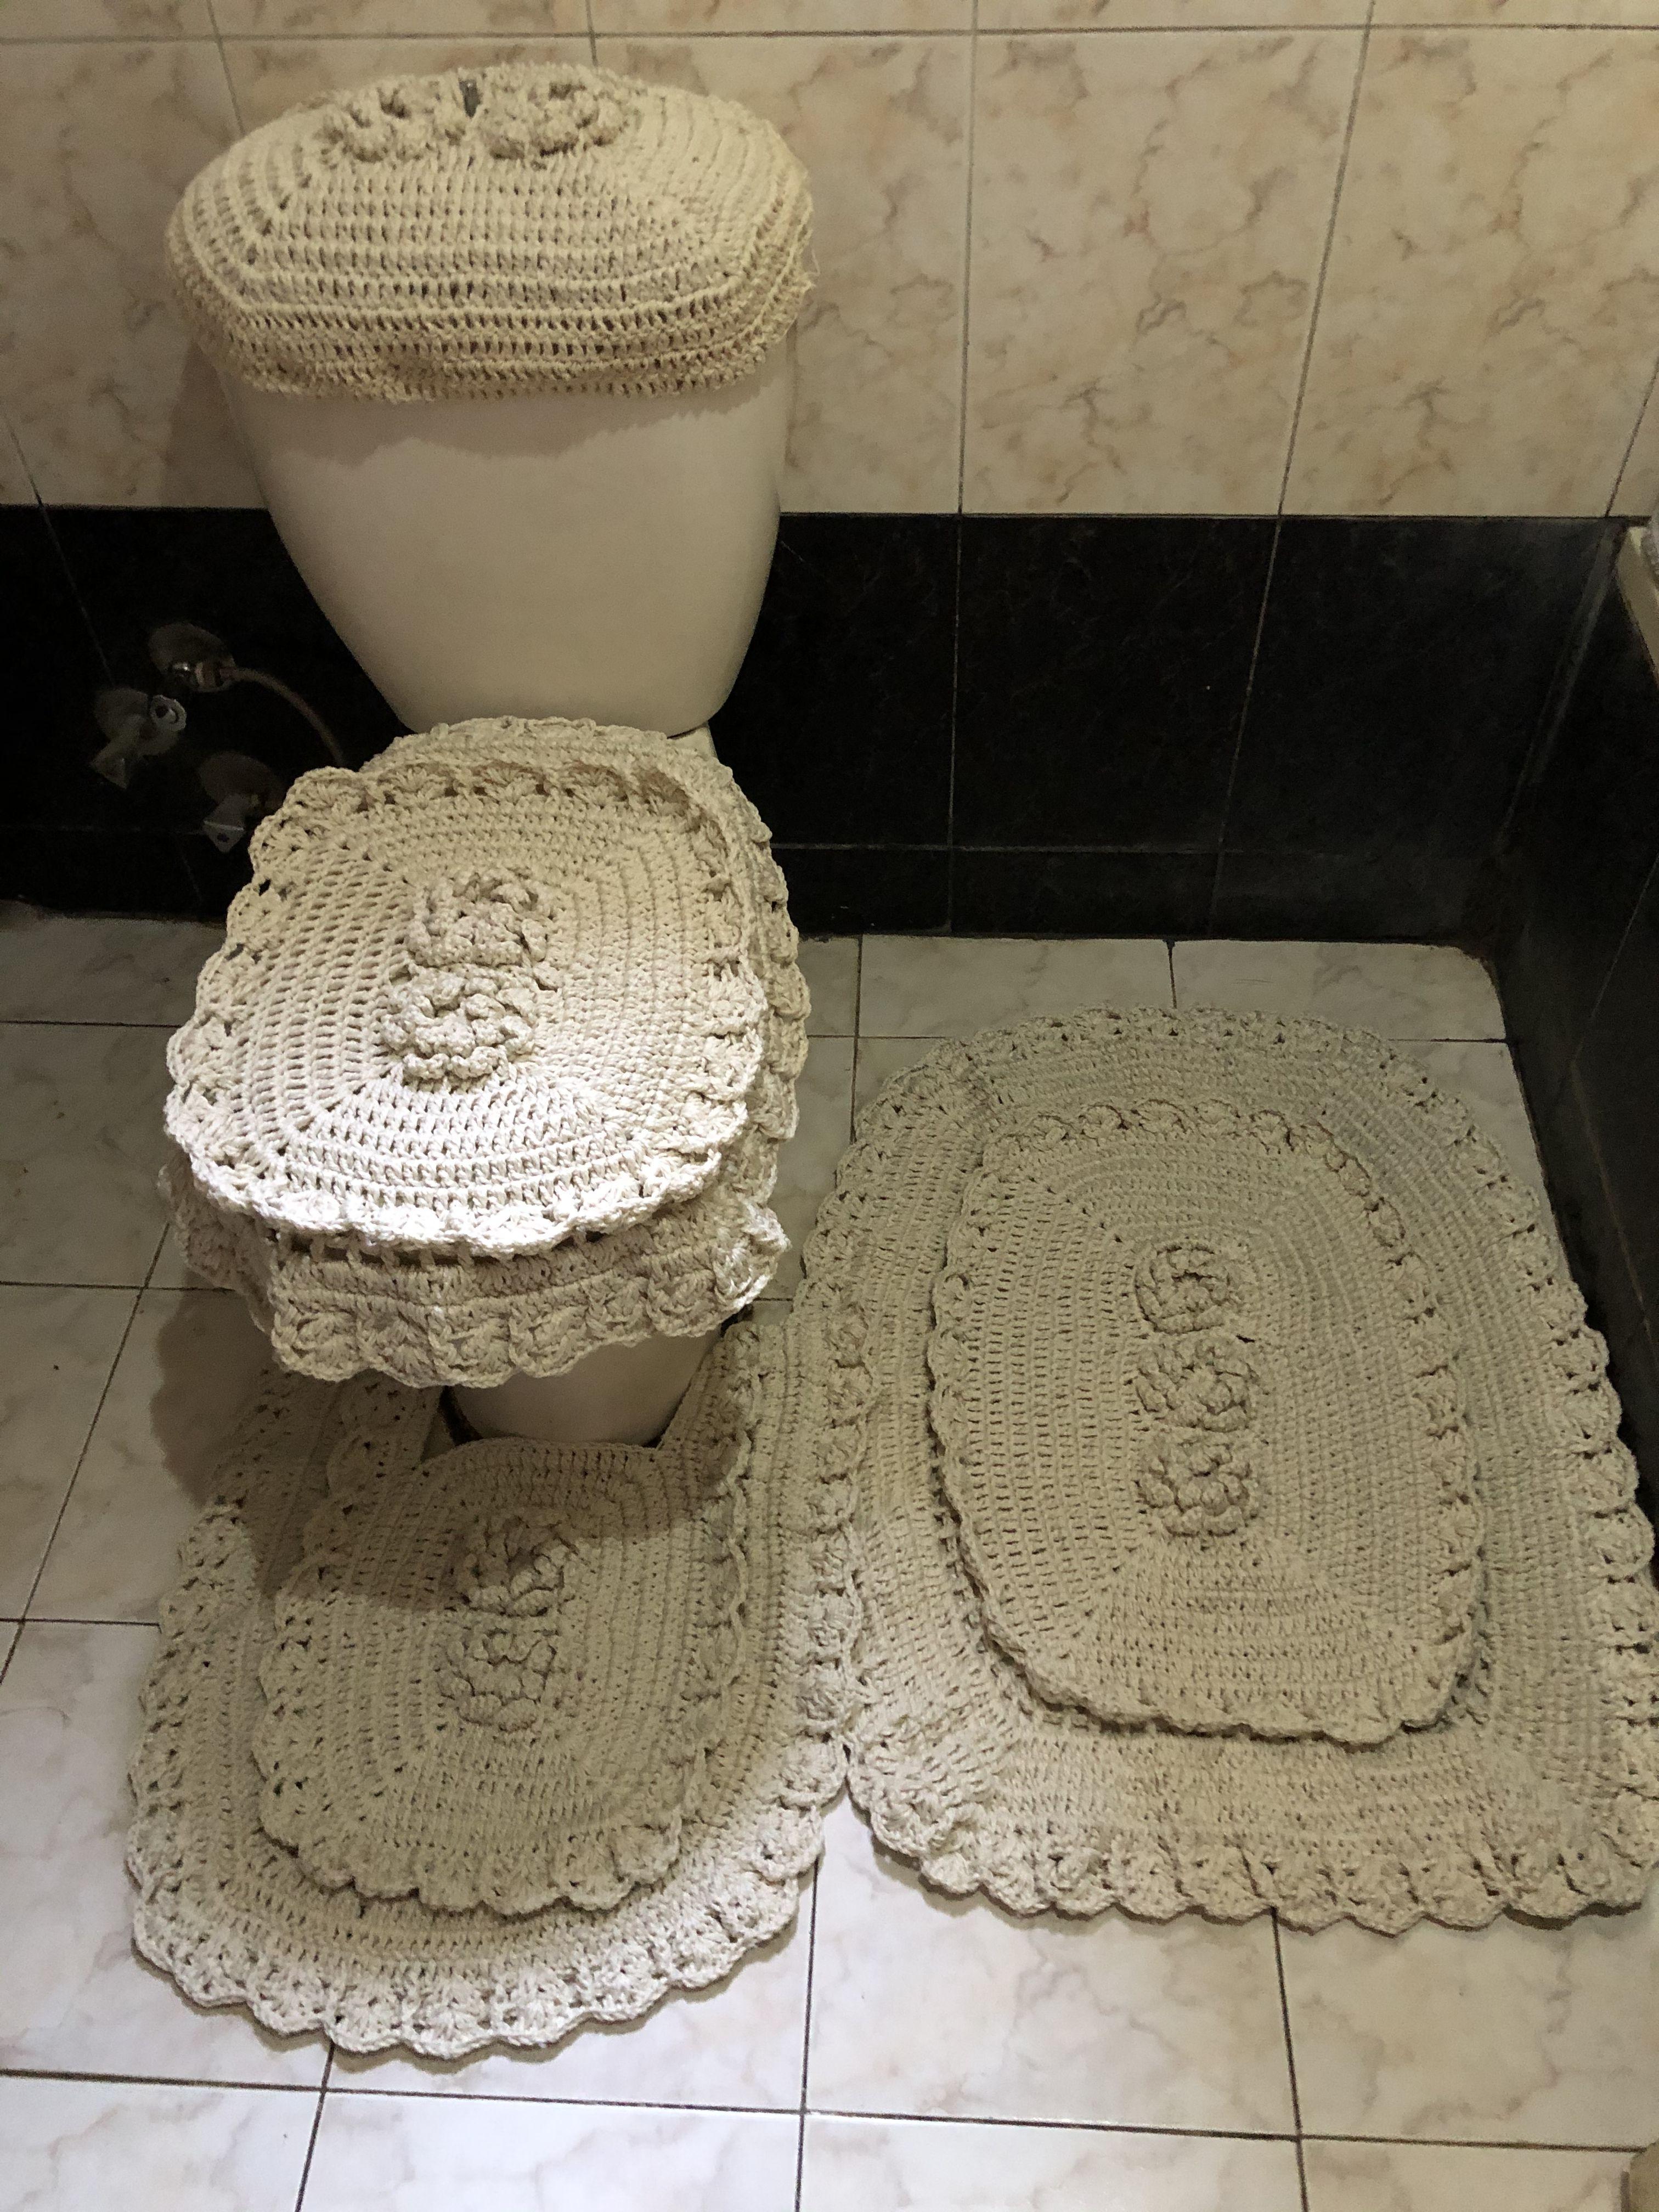 Pin By سلمي الزامك On اطقم حمام Home Decor Decor Bath Mat